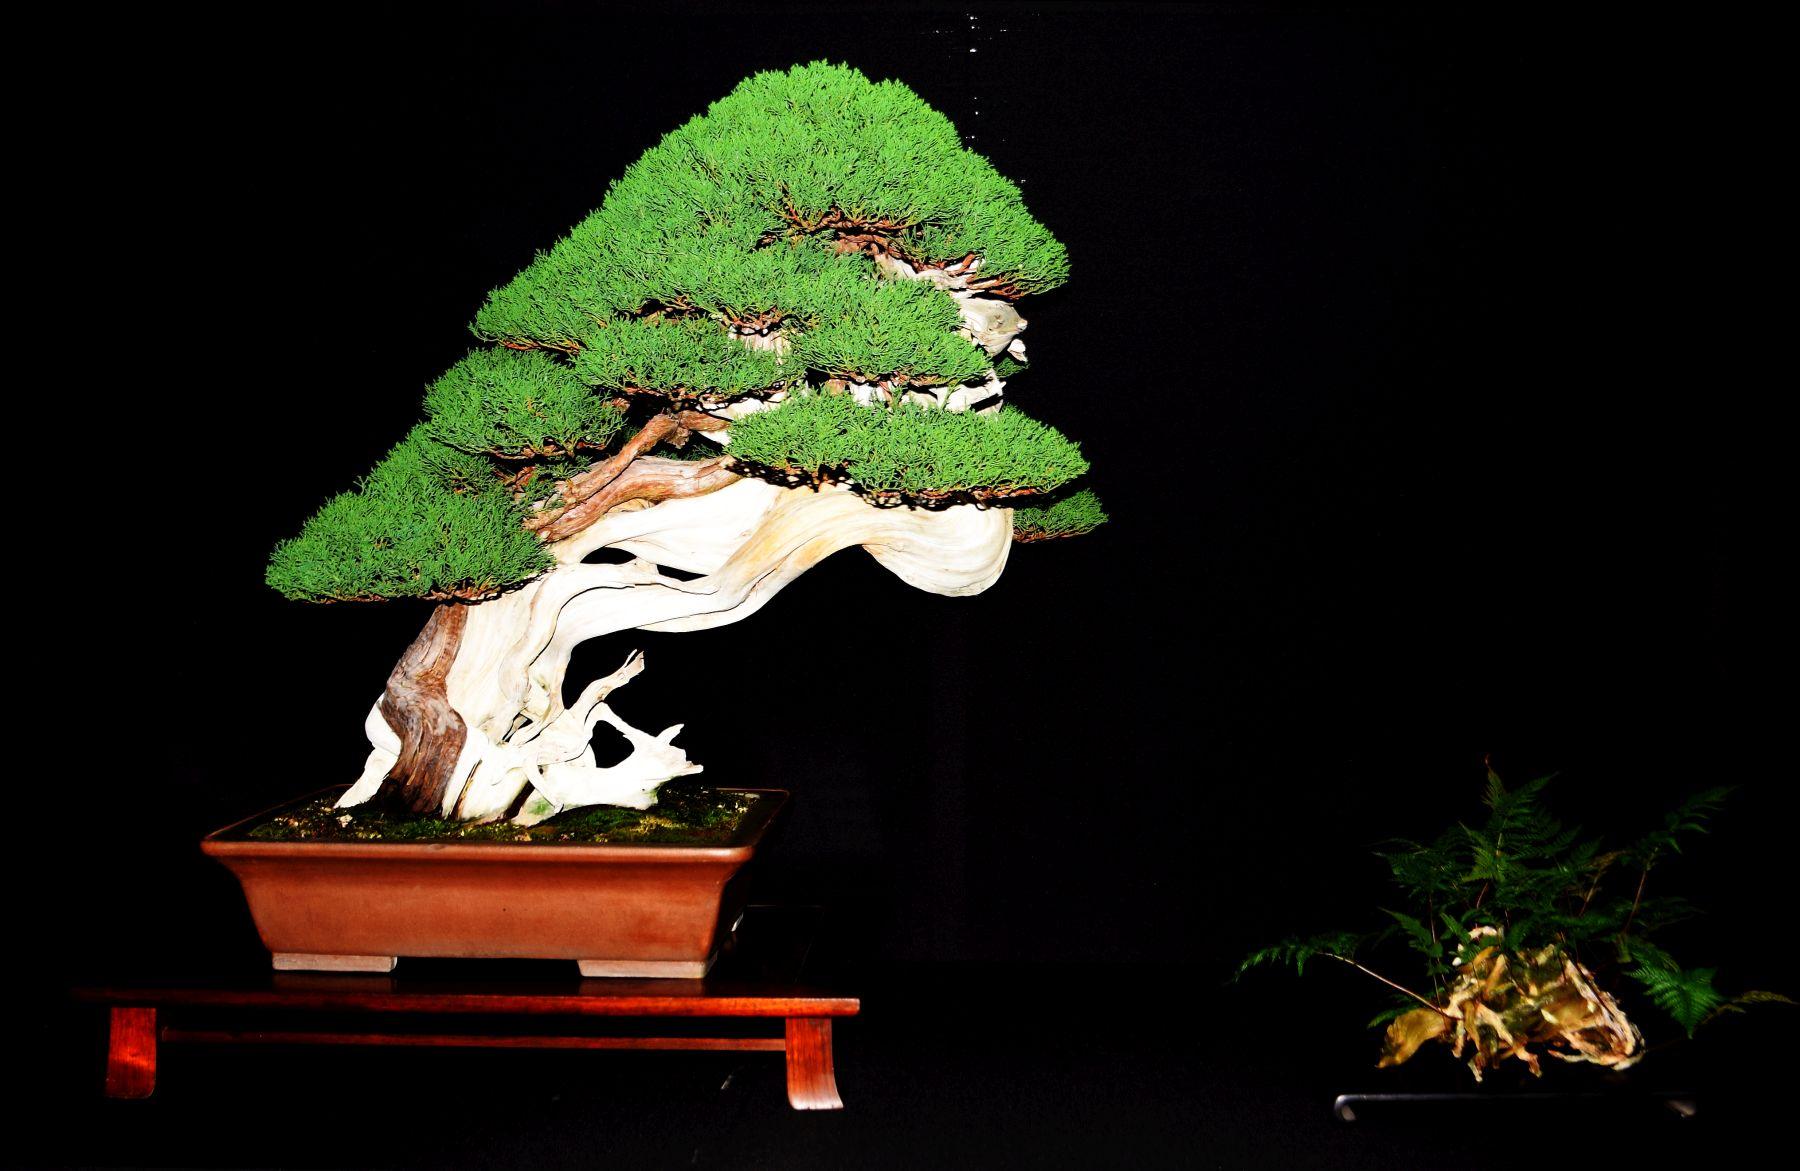 bonsai-museum-luis-vallejo-024